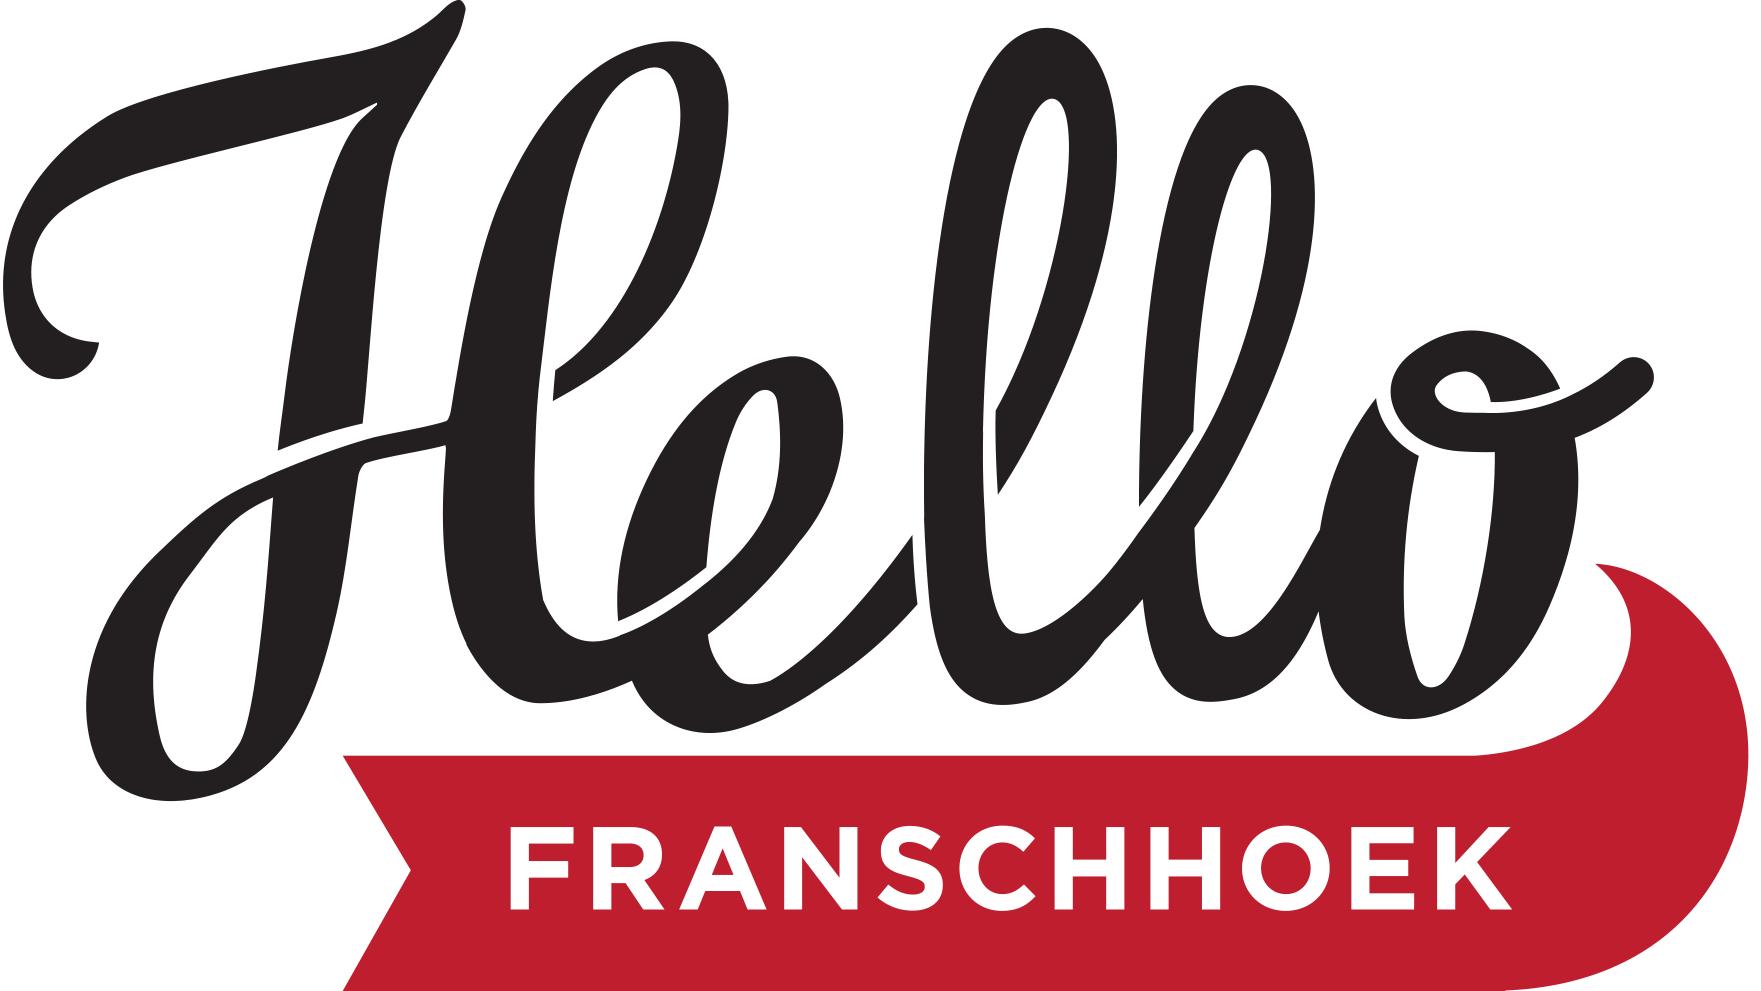 FORMAL-Hello-Franschhoek